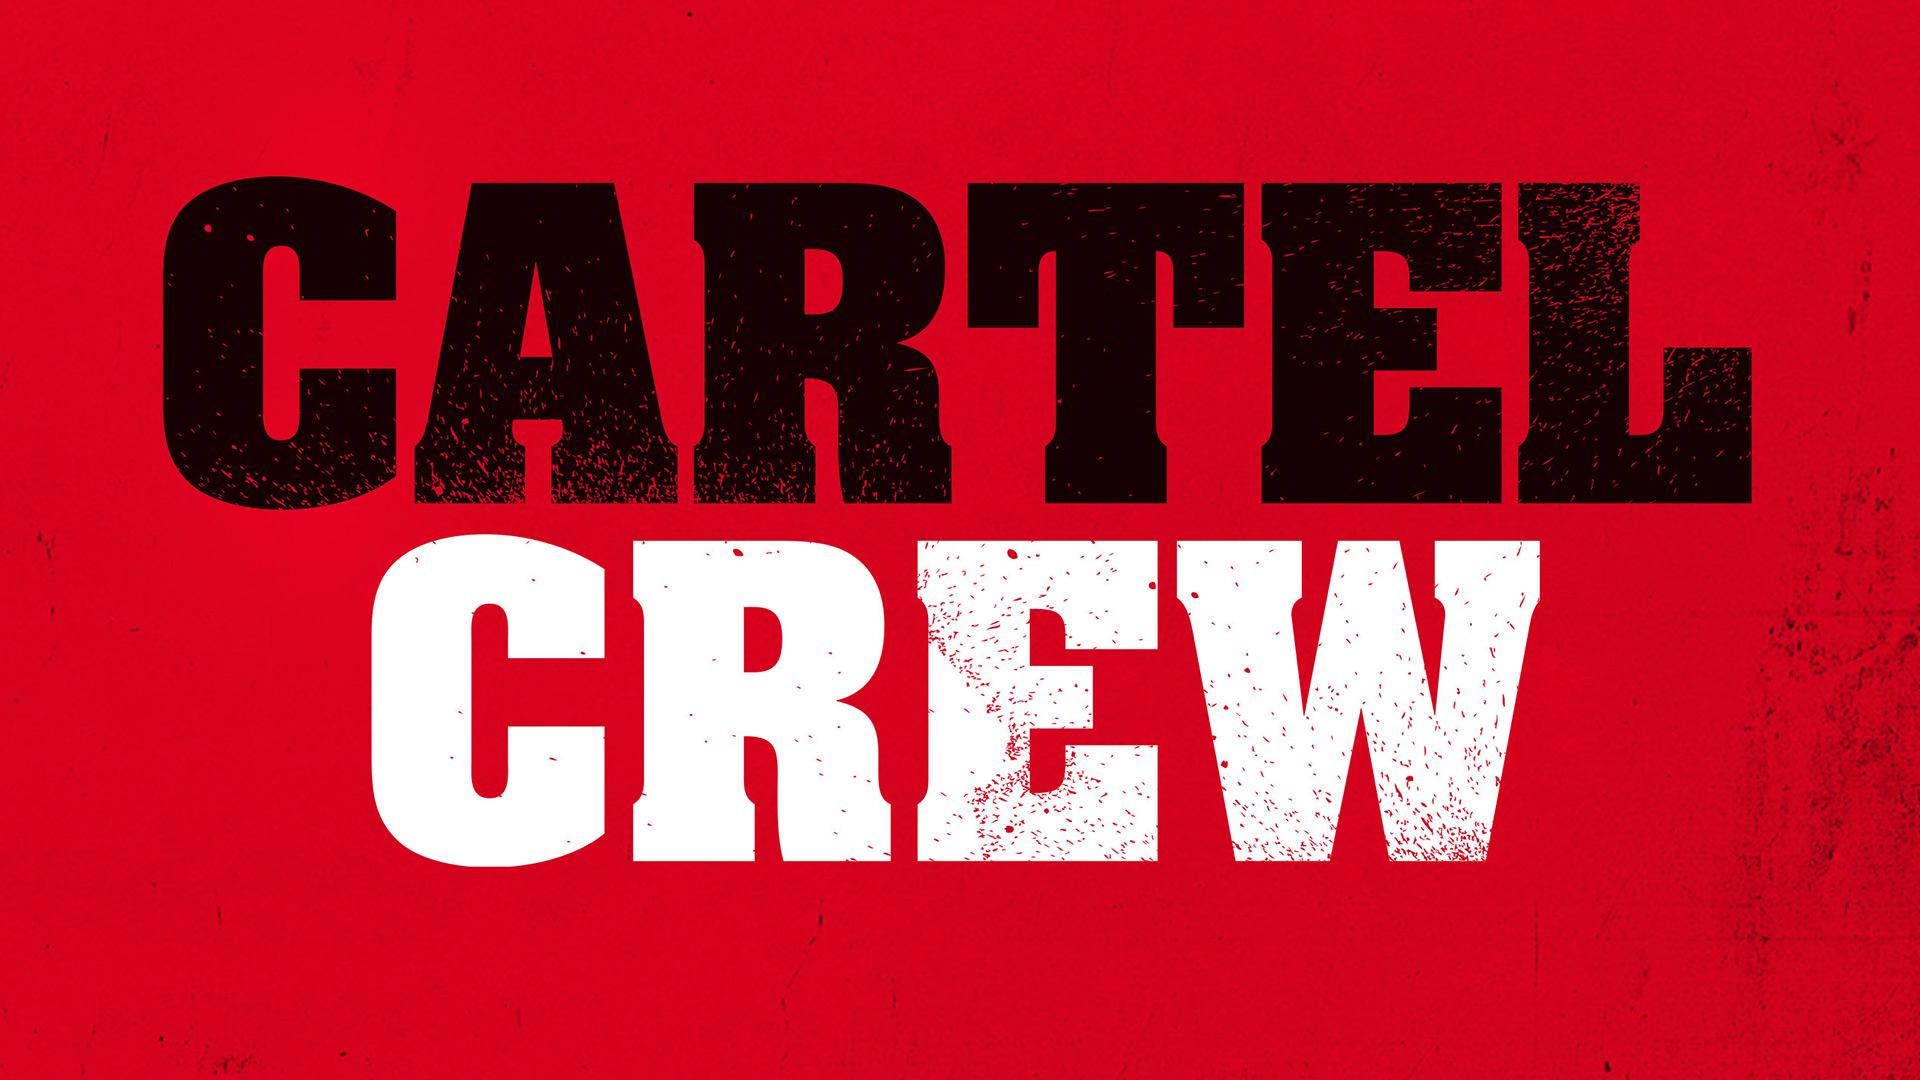 Cartel Crew Season 1